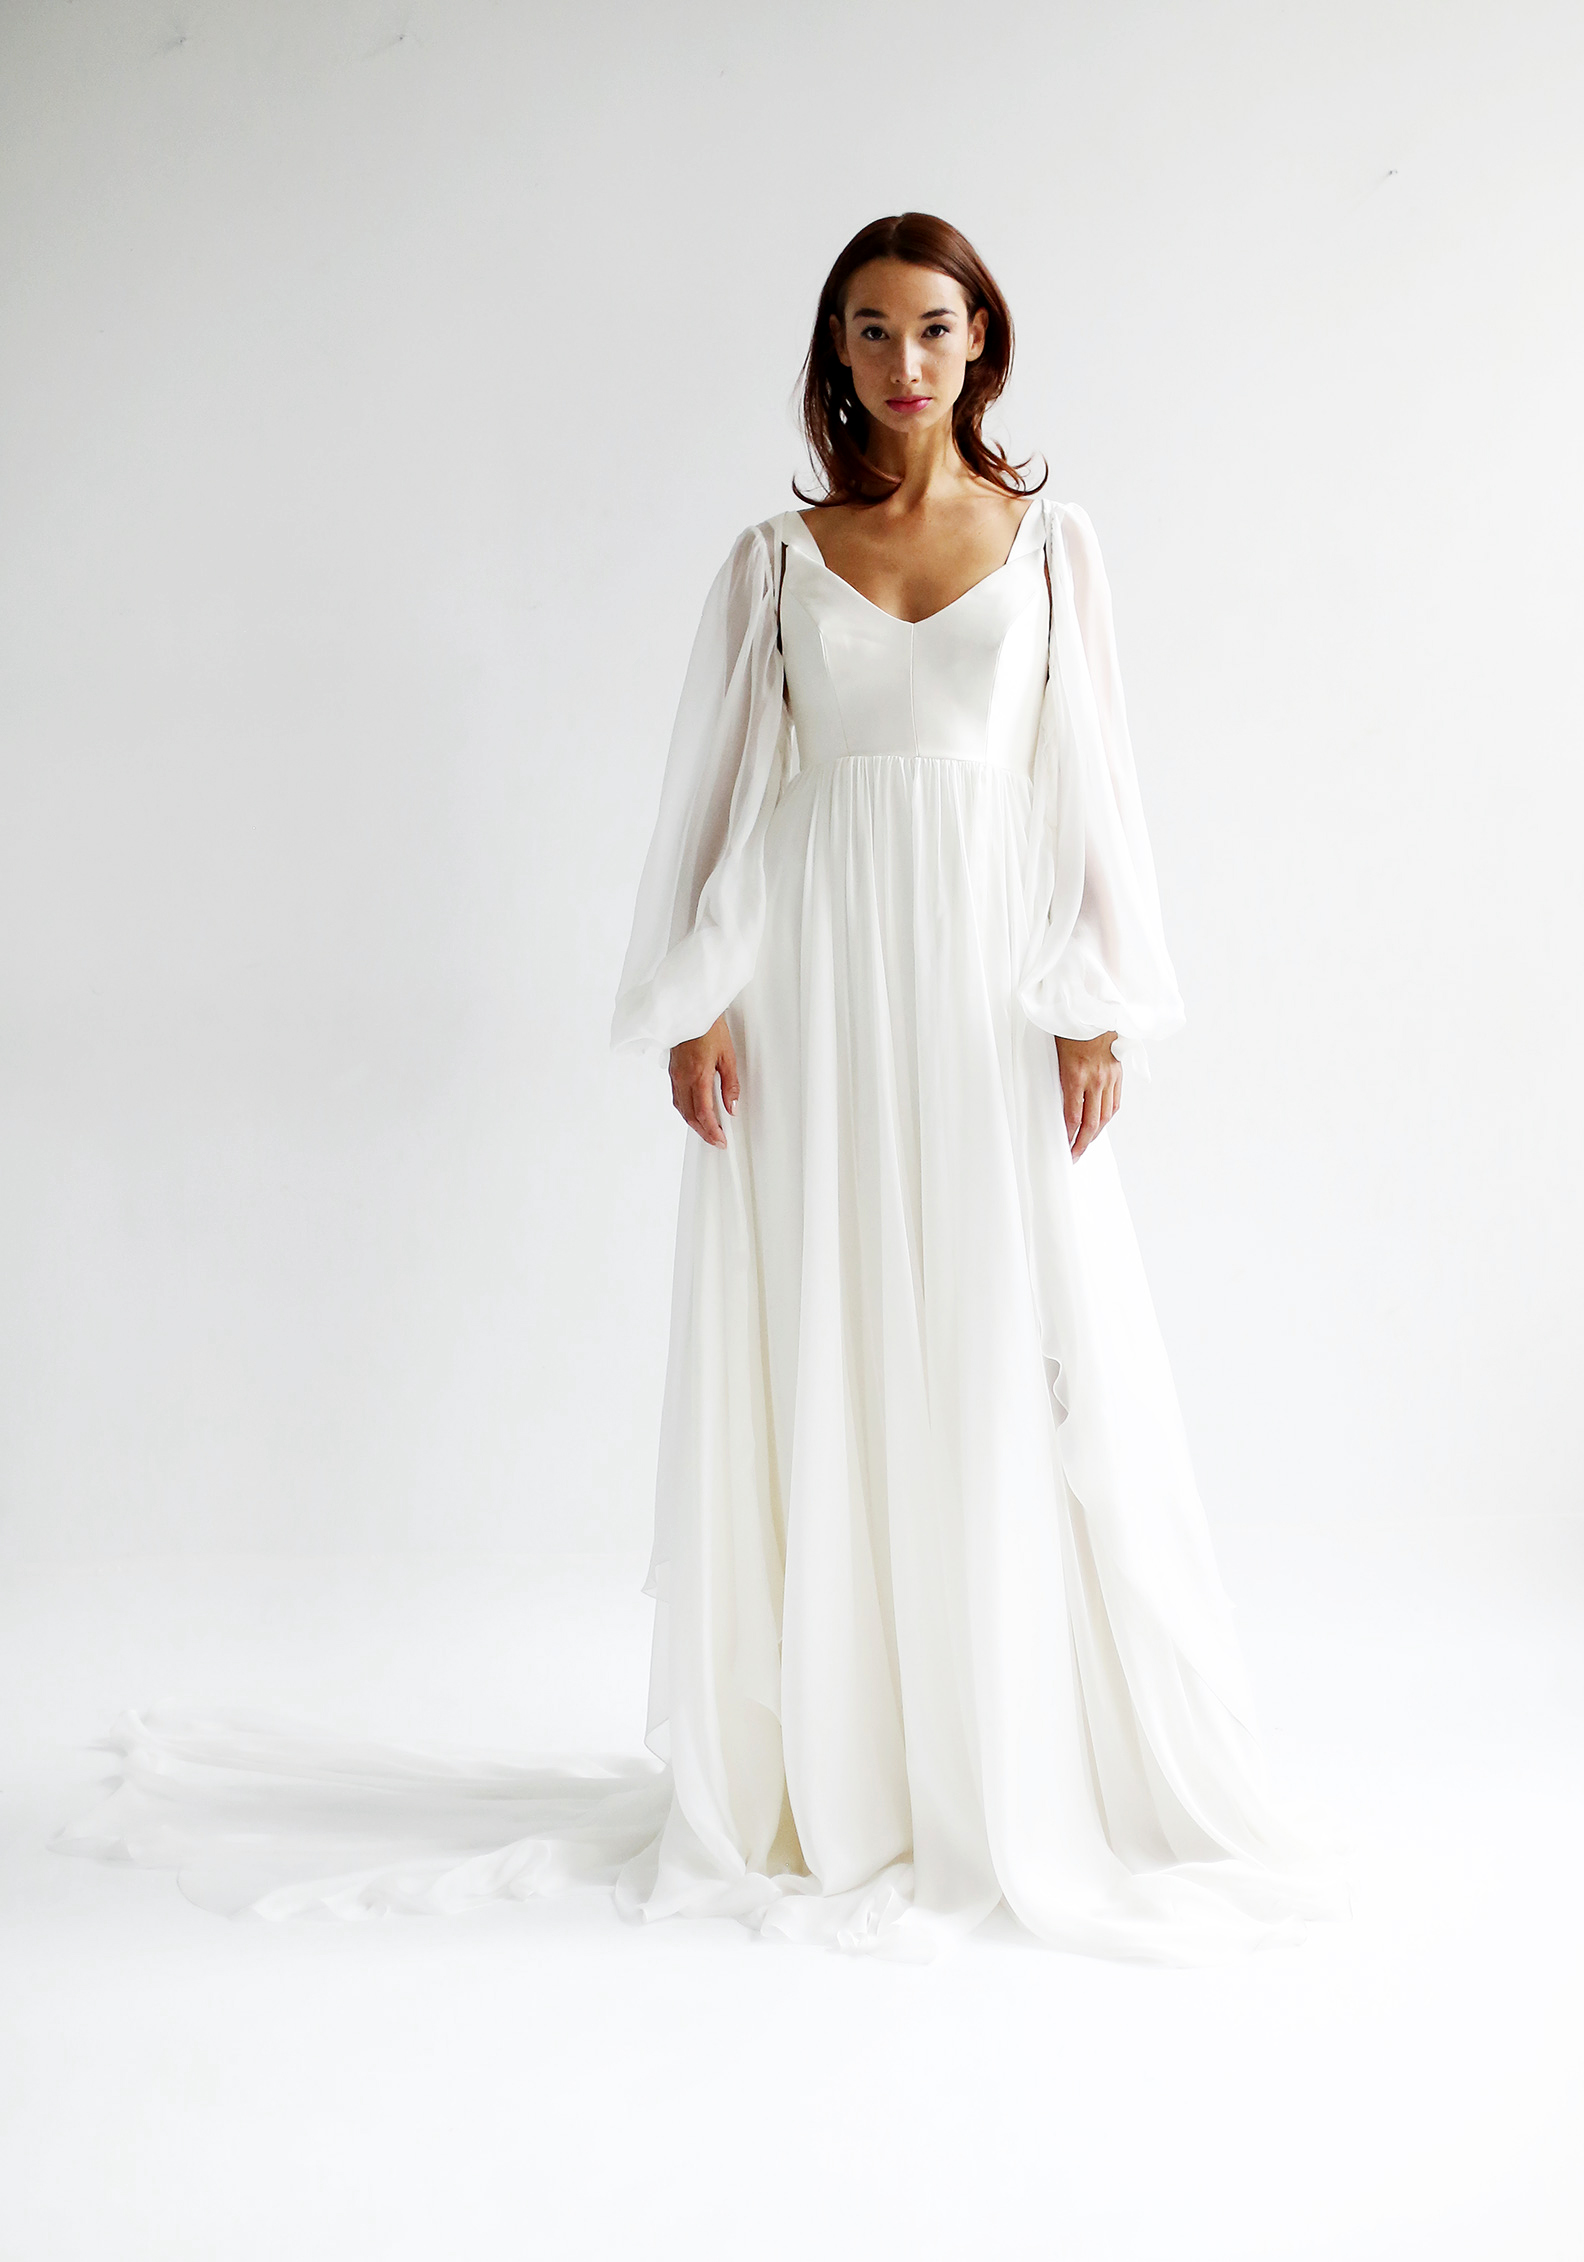 leanne marshall wedding dress spring 2019 long bell sleeves a-line